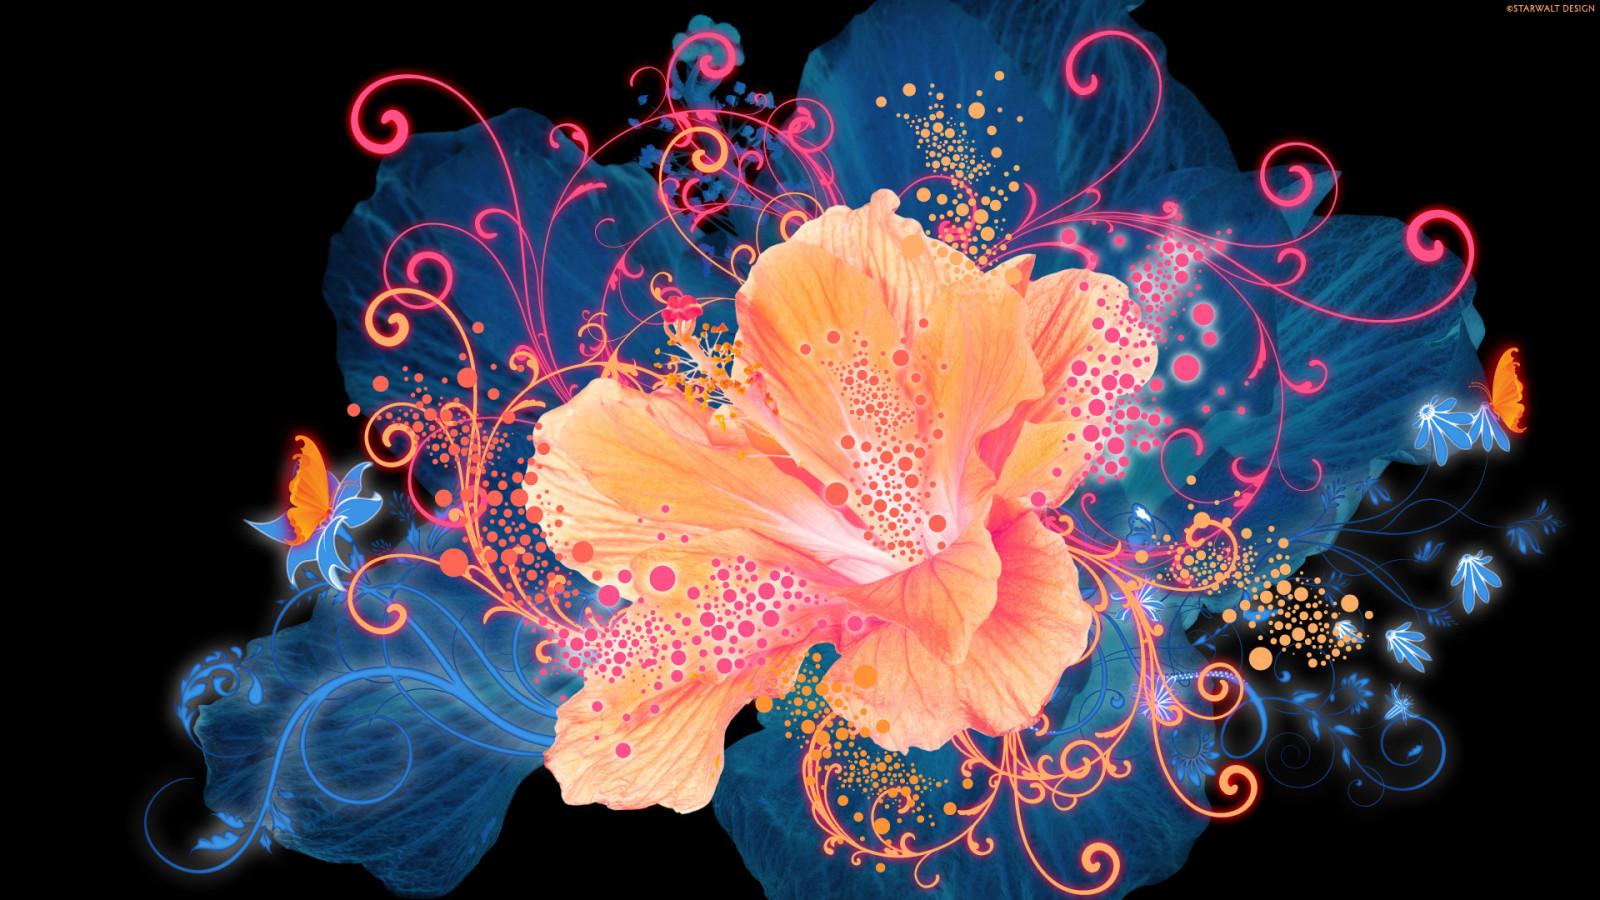 Добро пожаловать 1920x1080_px_abstract_art_artistic_Bright_colors_contrast_flowers-1774455